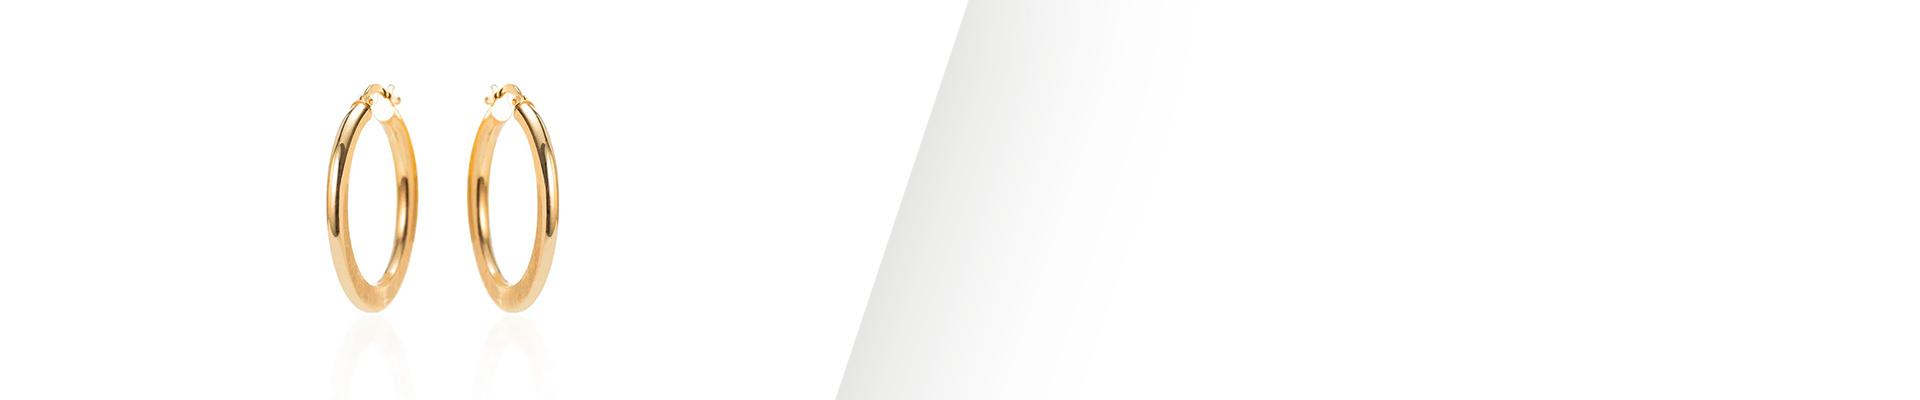 Banner Brincos de Argola